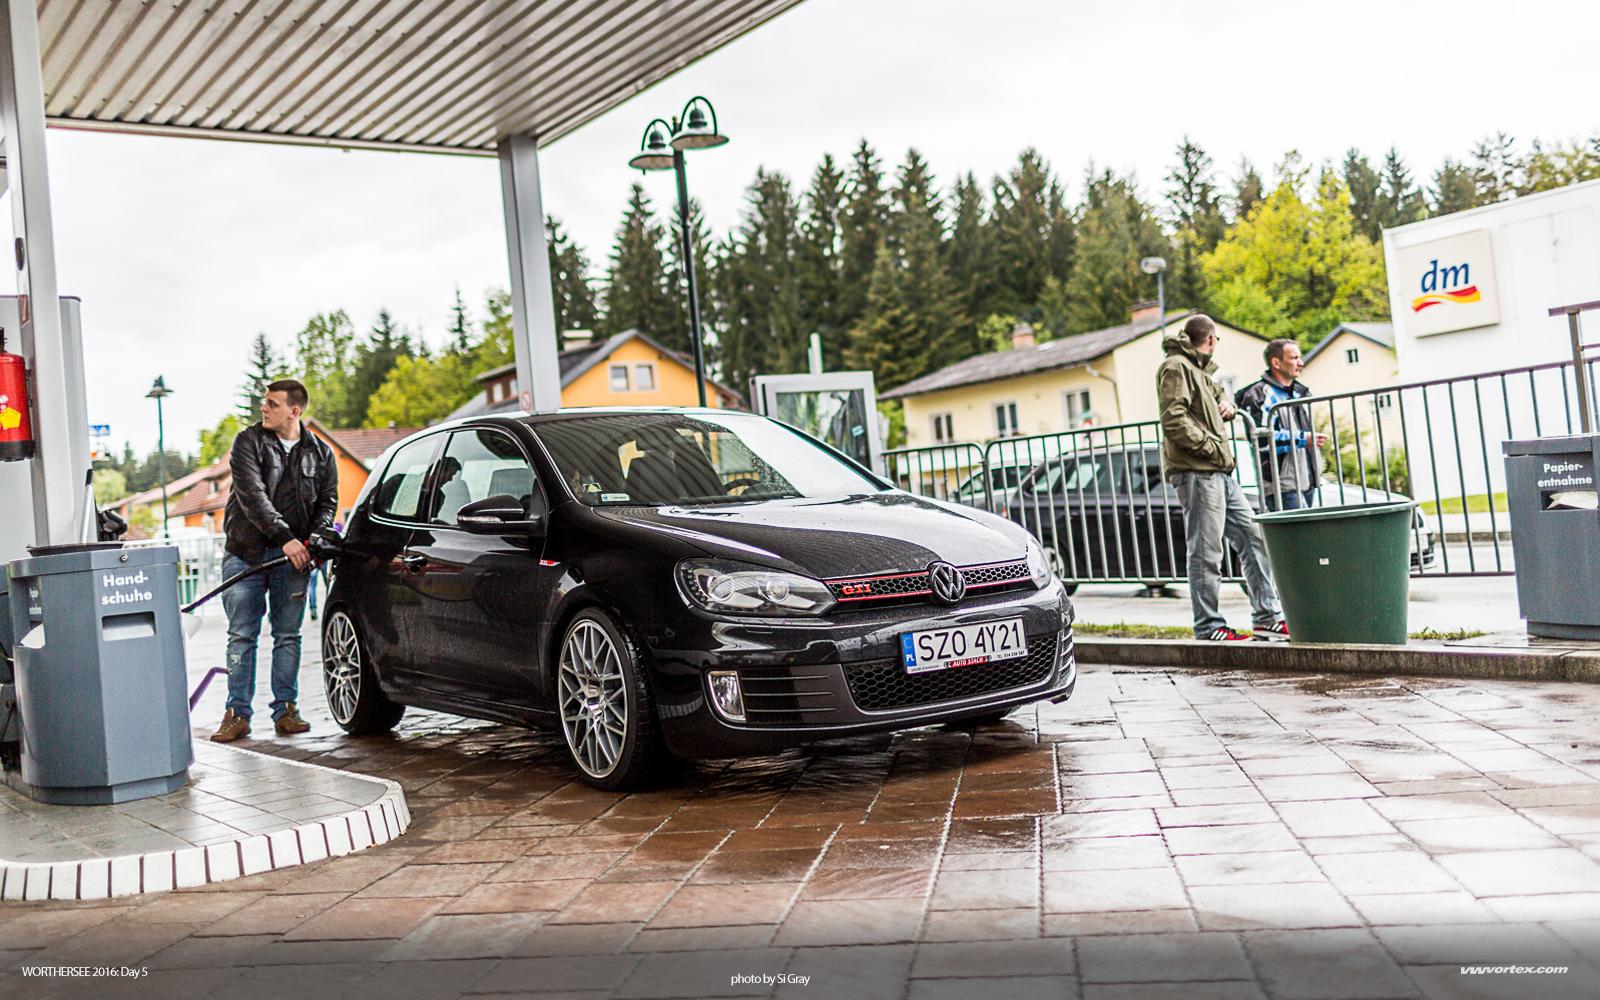 Audi-A5-Cabriolet-B9-test-mule-282